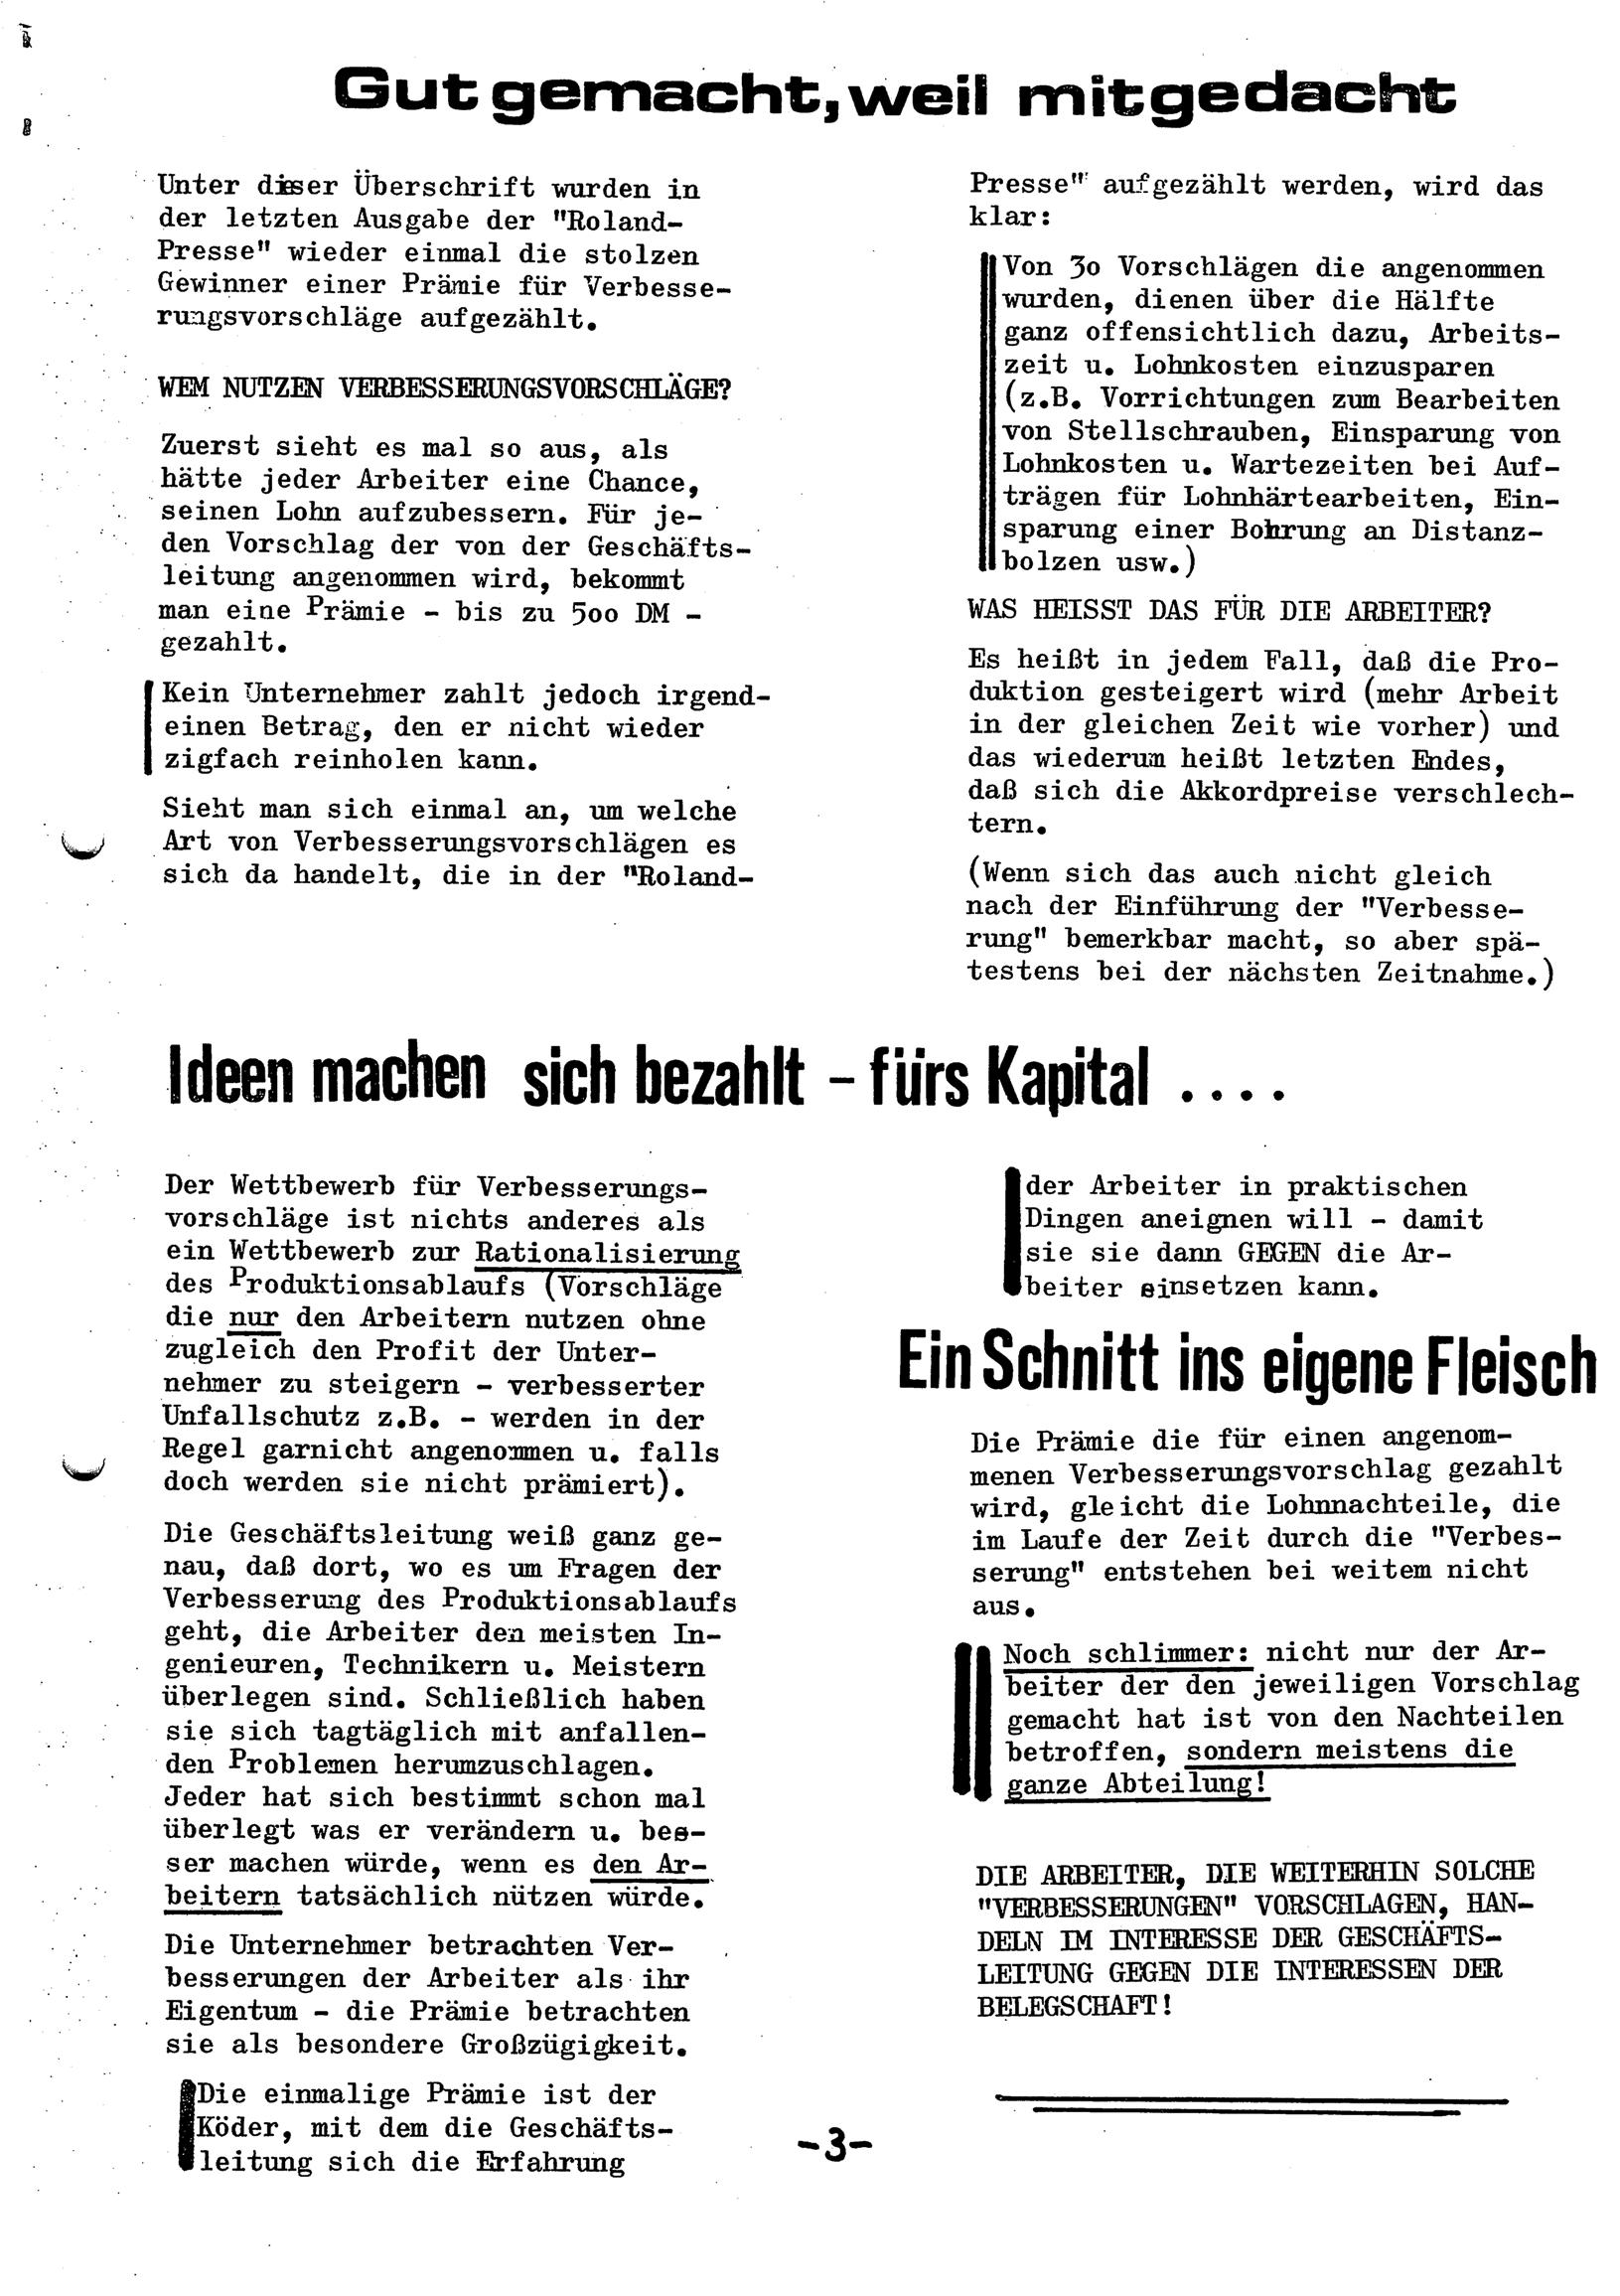 Offenbach019